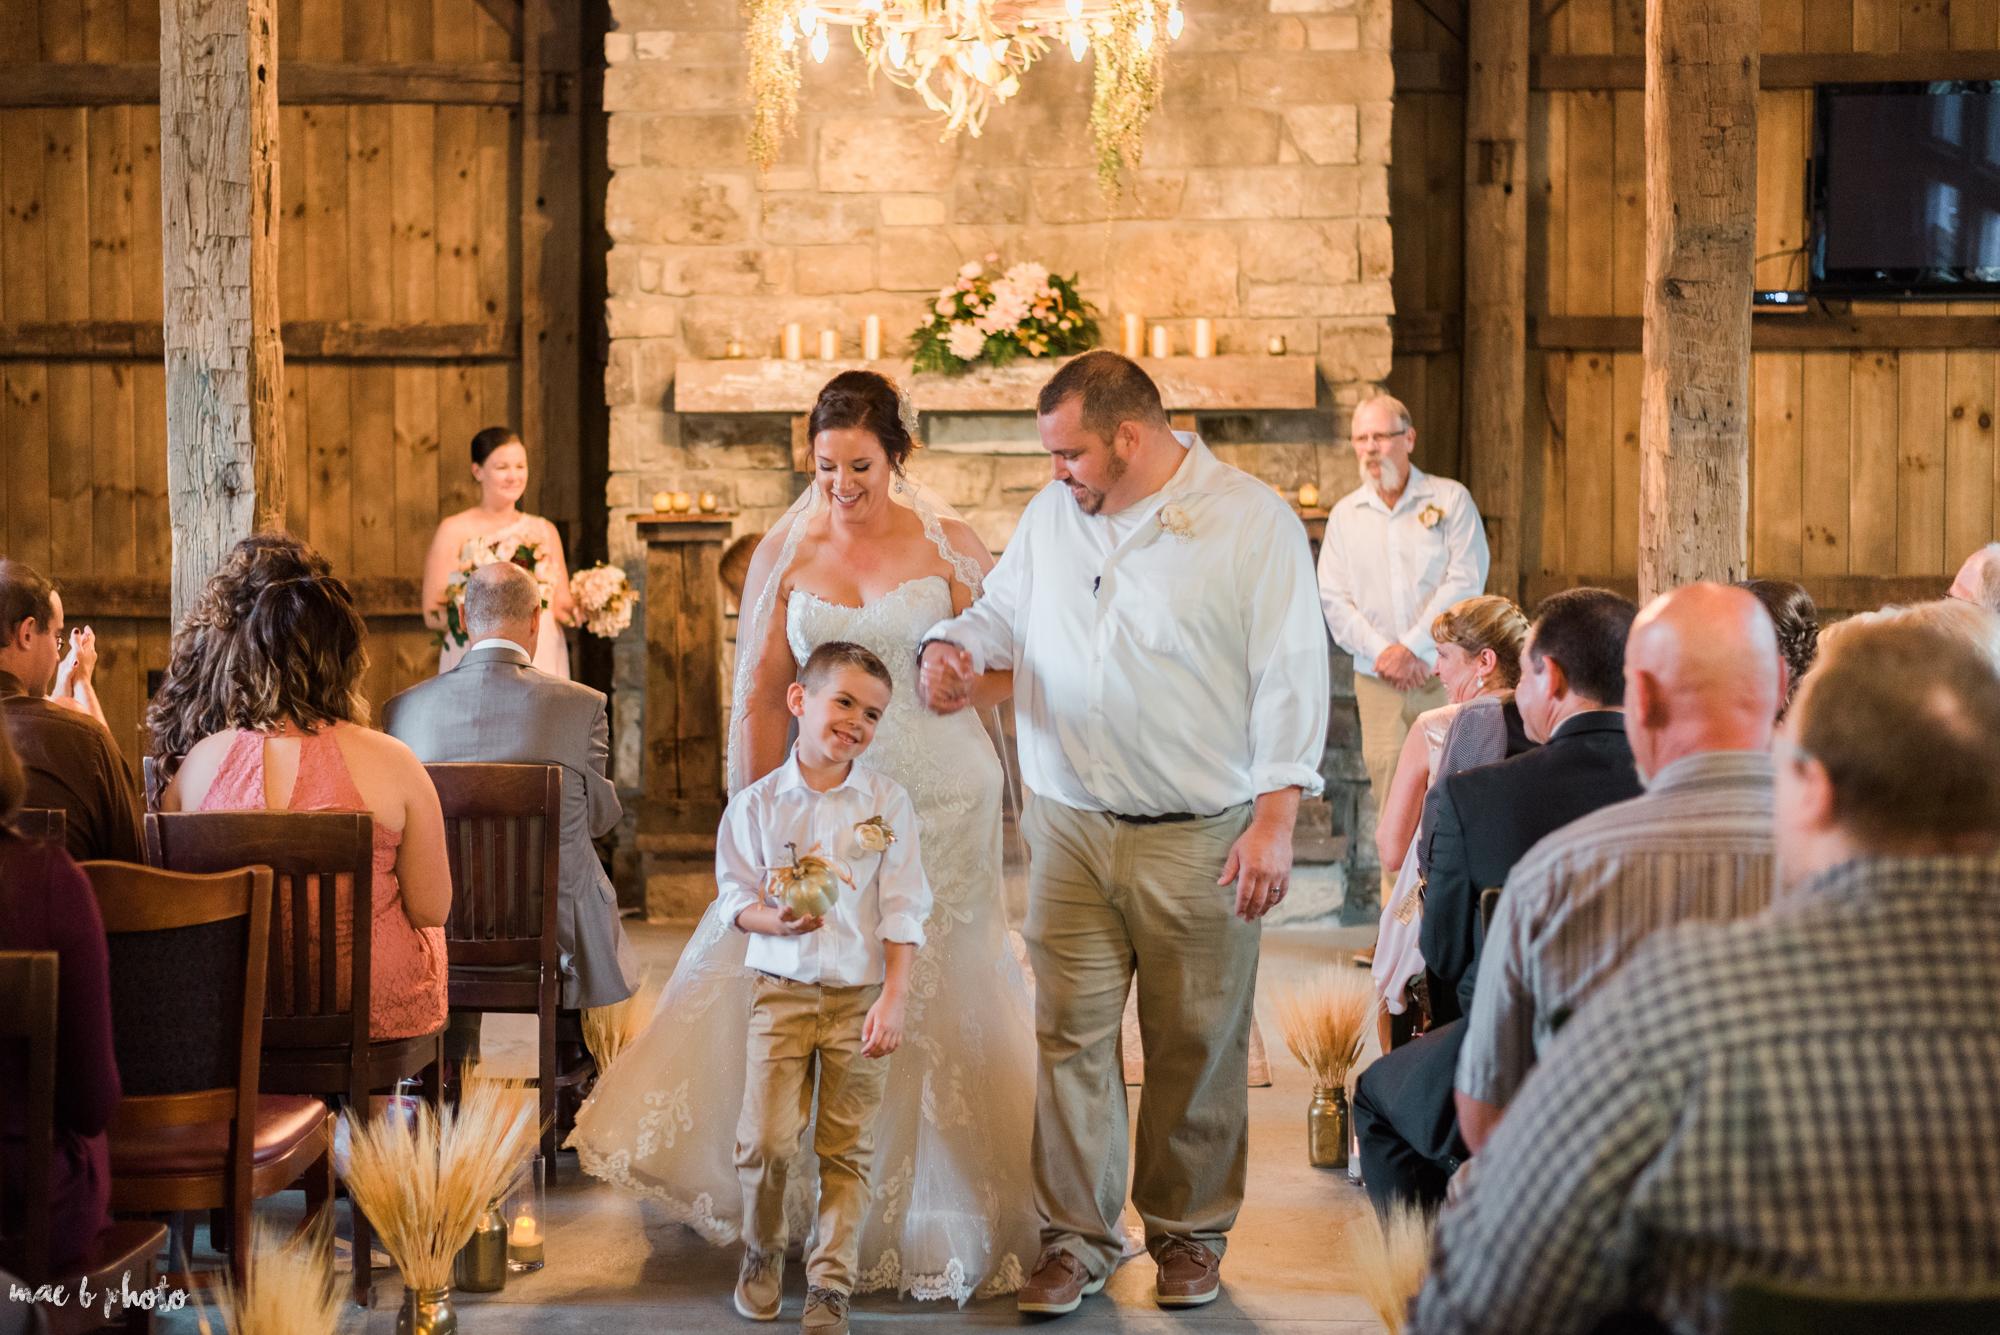 Sarah & Dustin's Rustic Chic Barn Wedding at Hartford Hill Winery in Hartford, Ohio by Mae B Photo-49.jpg